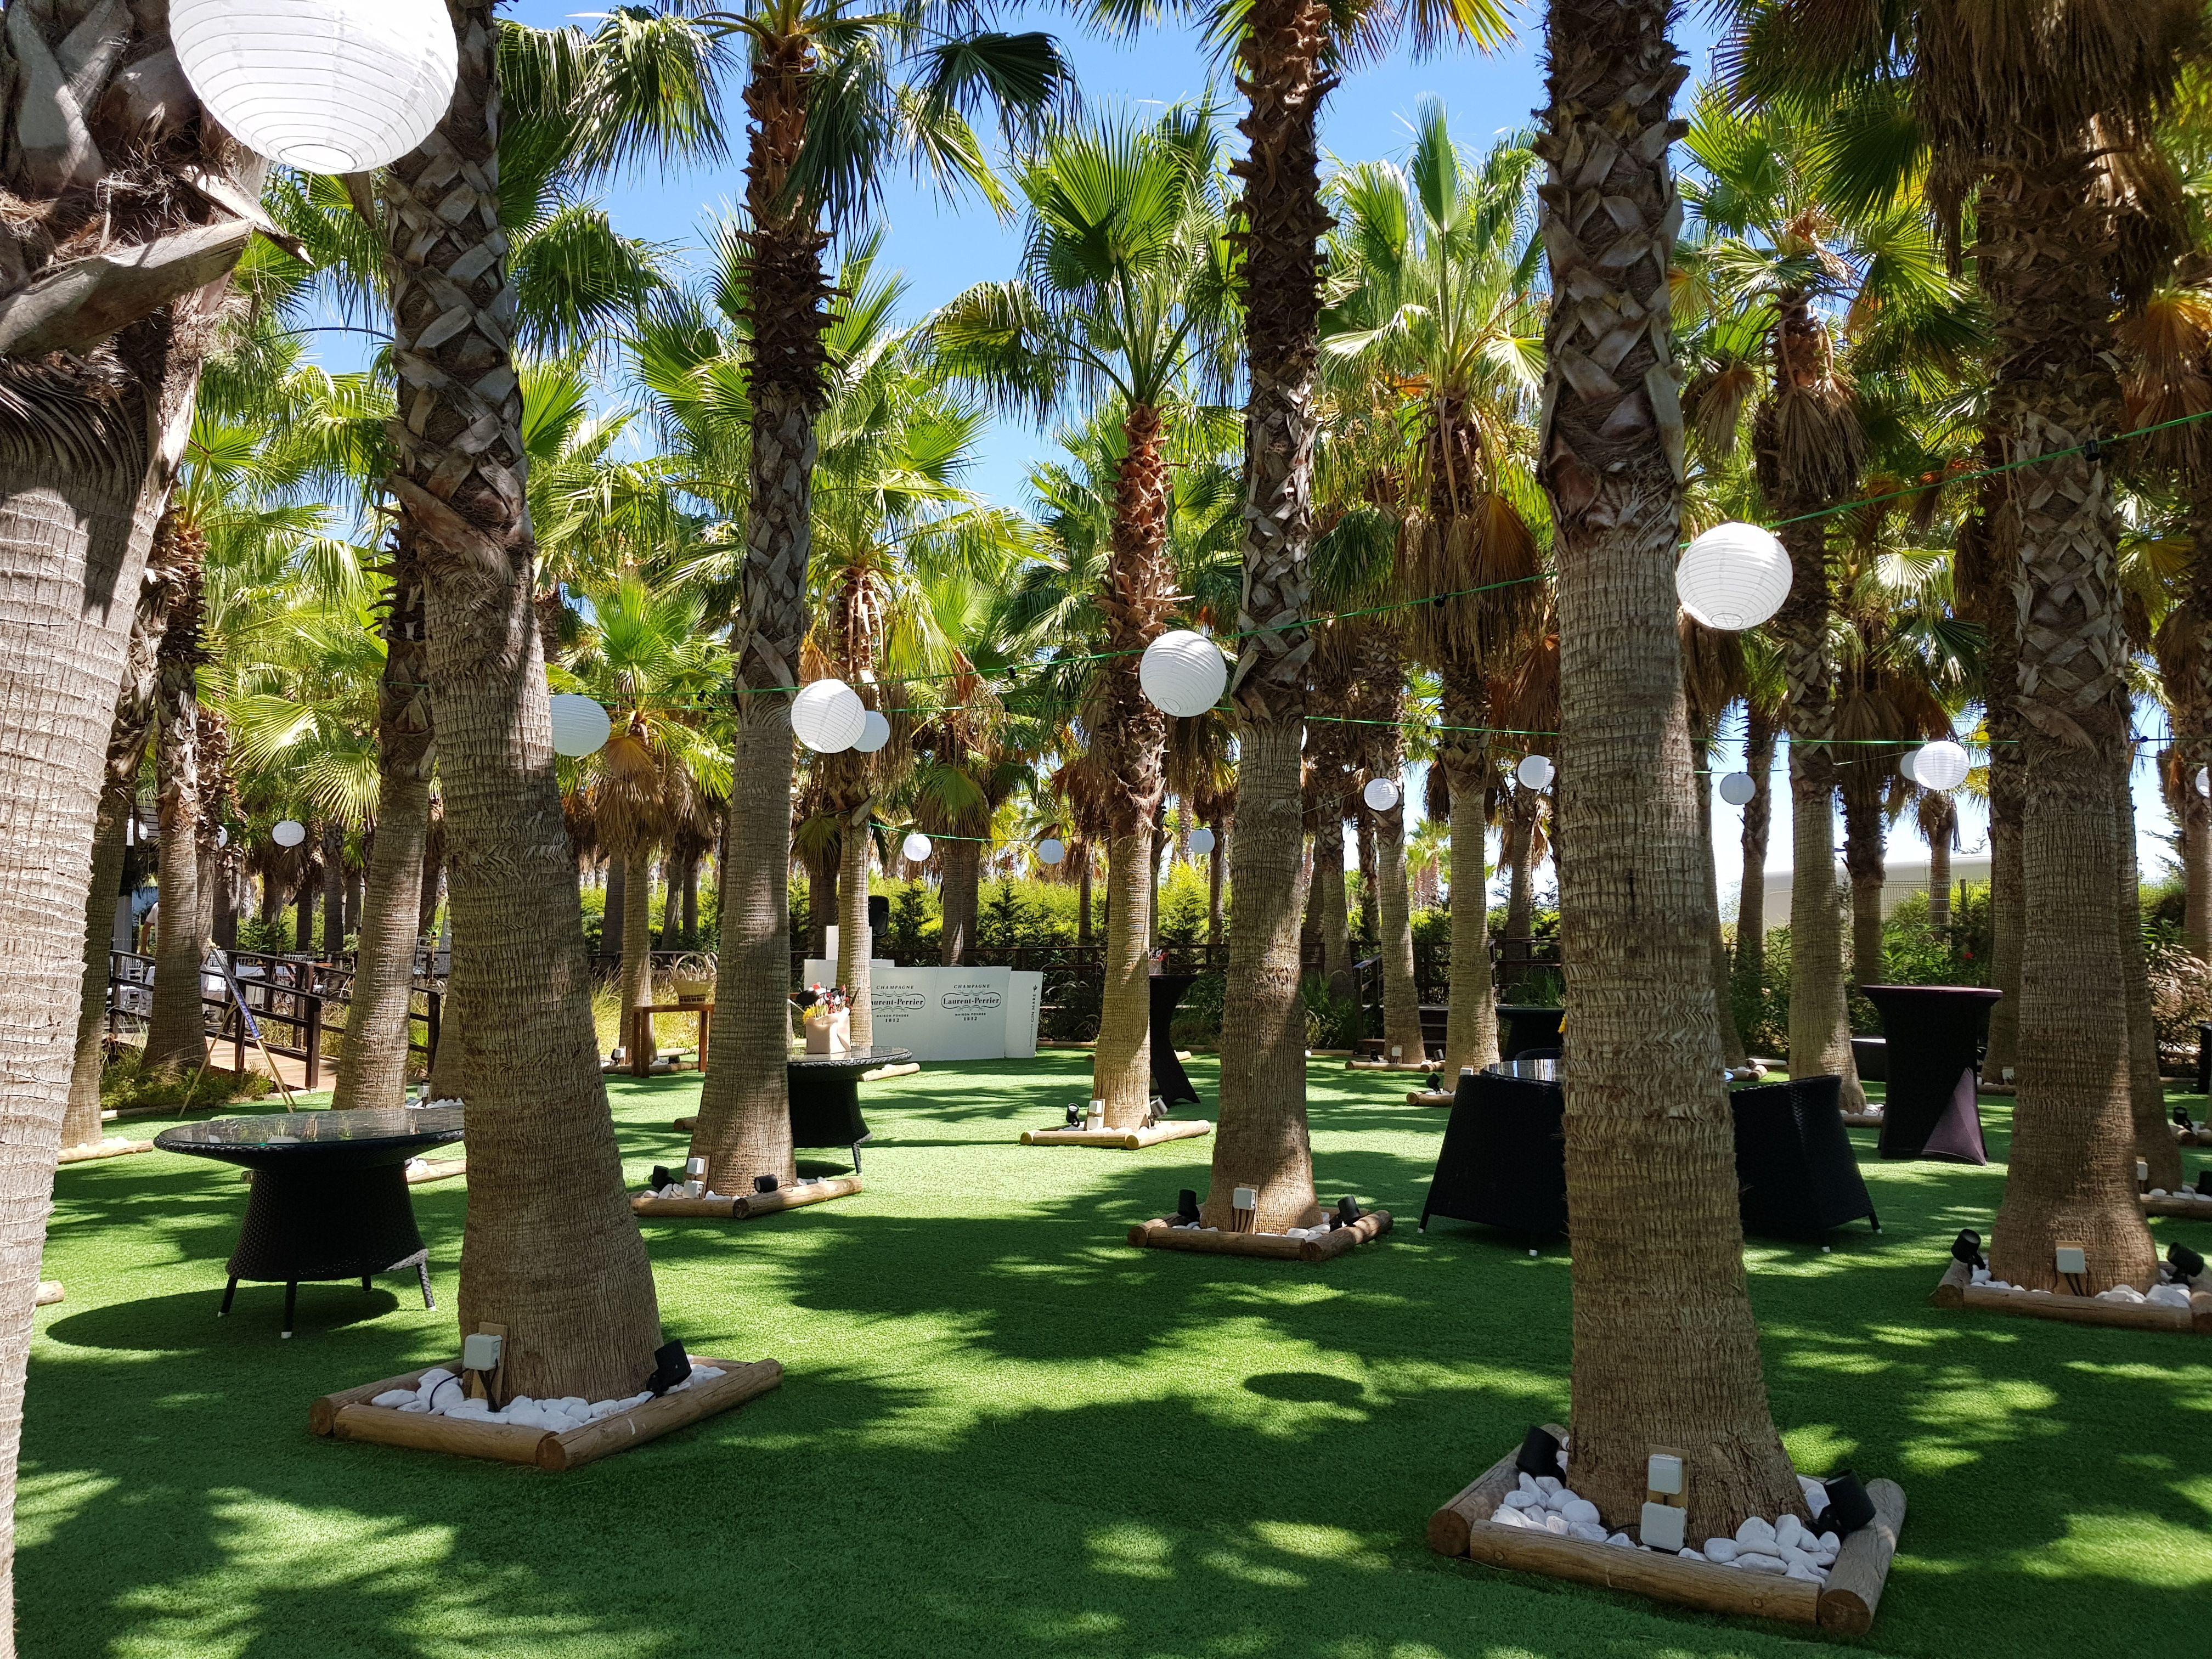 Algarve Palm Tree Gardens Wedding, Portugal | Weddings in the ...